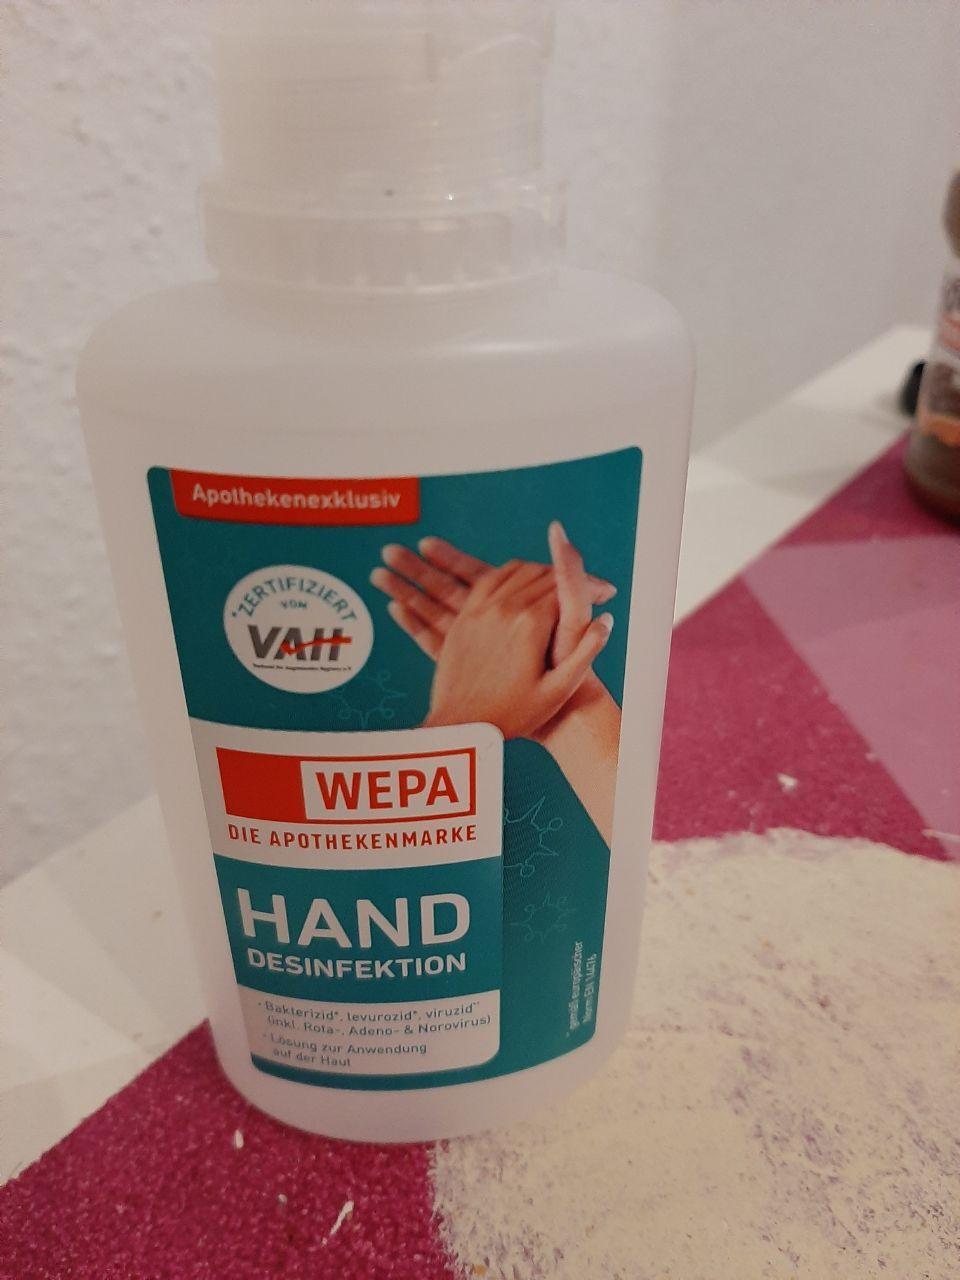 ای لعنت کنه پدر و مادر کرونا رو In 2020 Hand Soap Bottle Soap